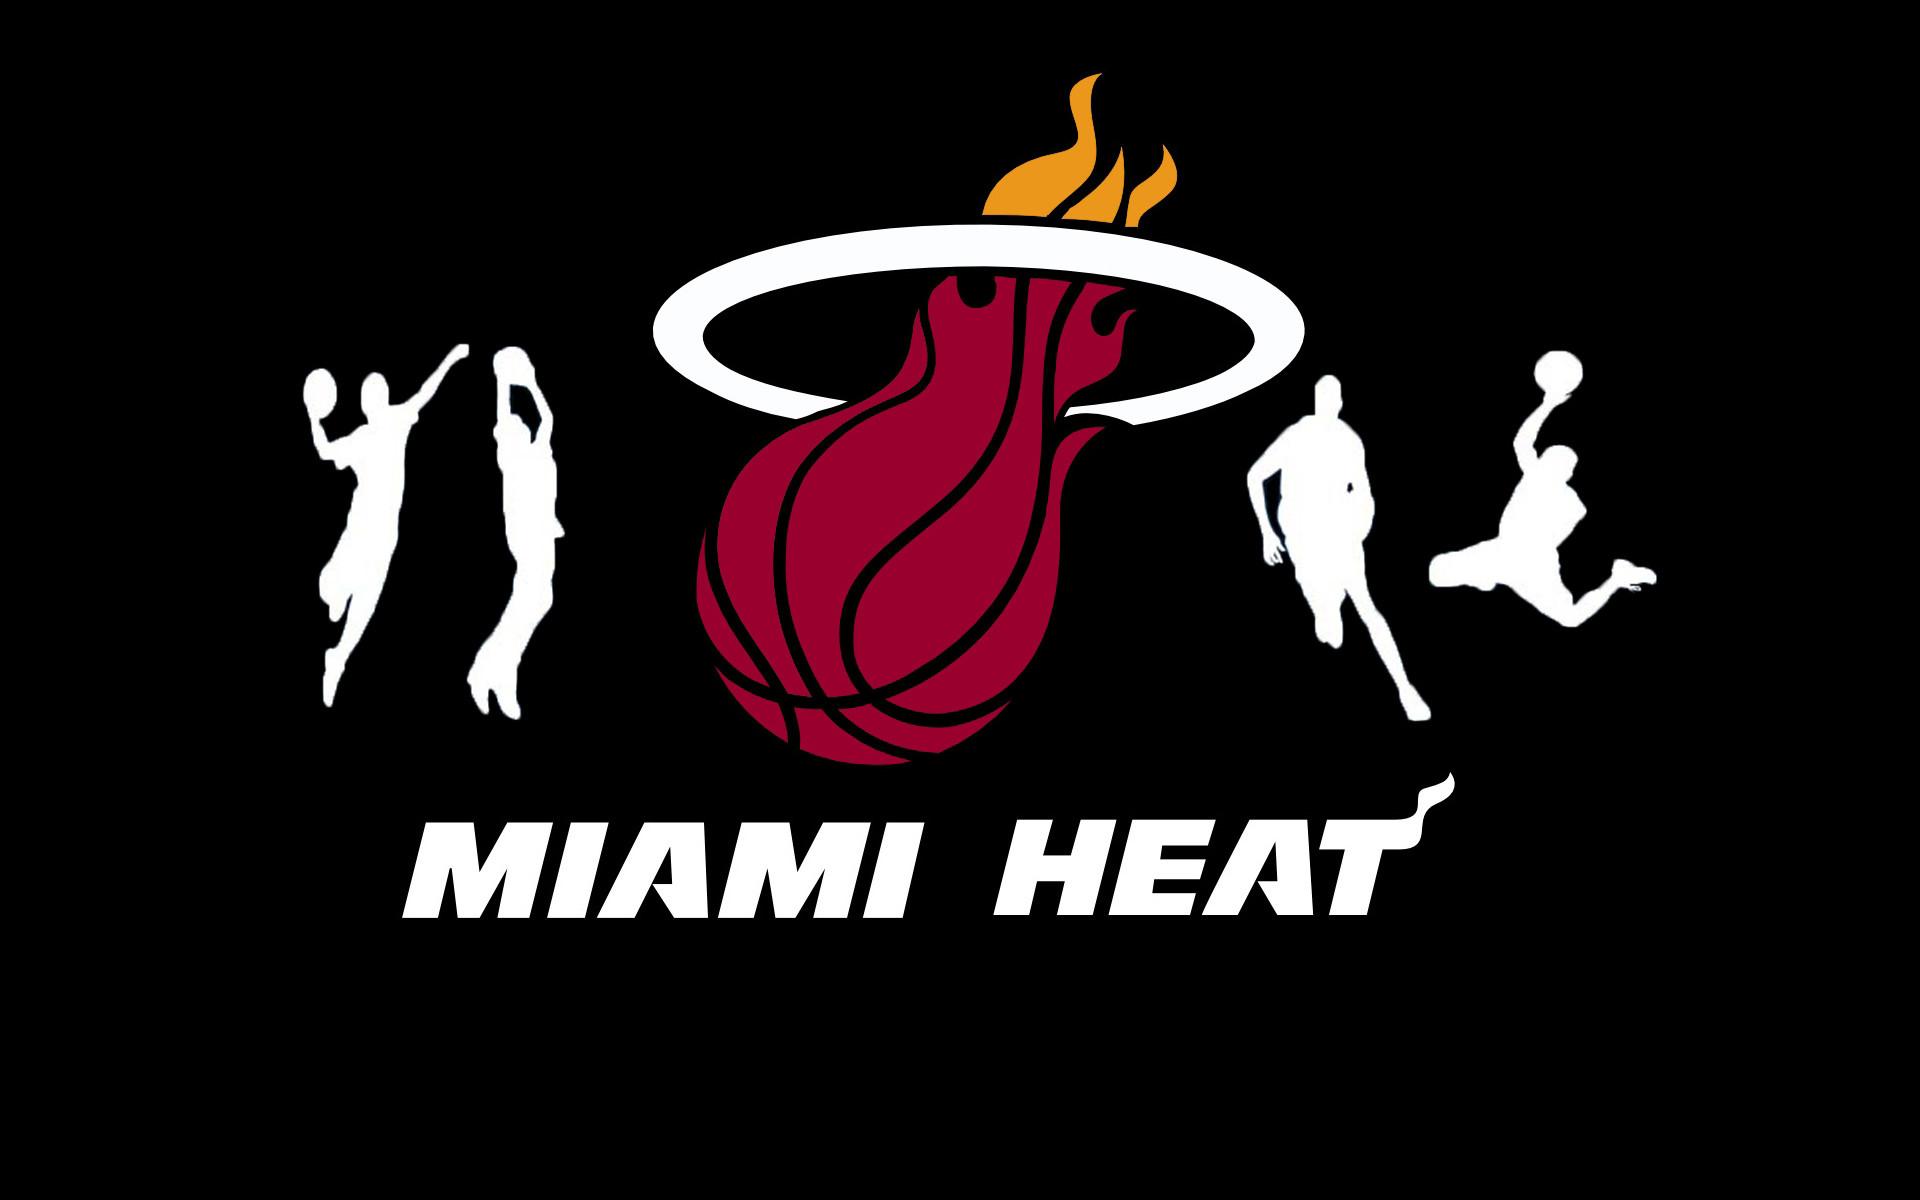 Miami Heat Wallpaper   wallpapers55.com – Best Wallpapers for PCs .